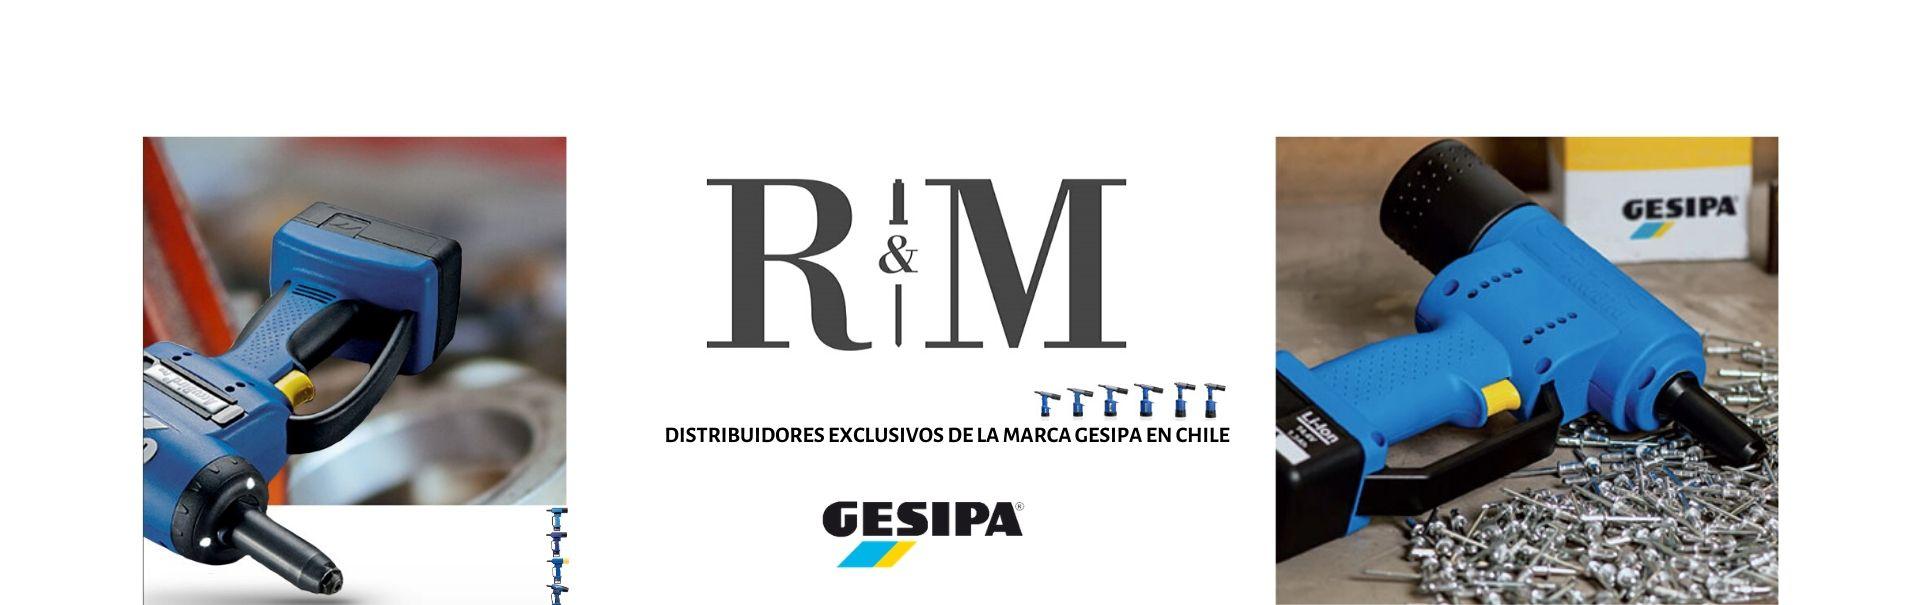 GESIPA-M